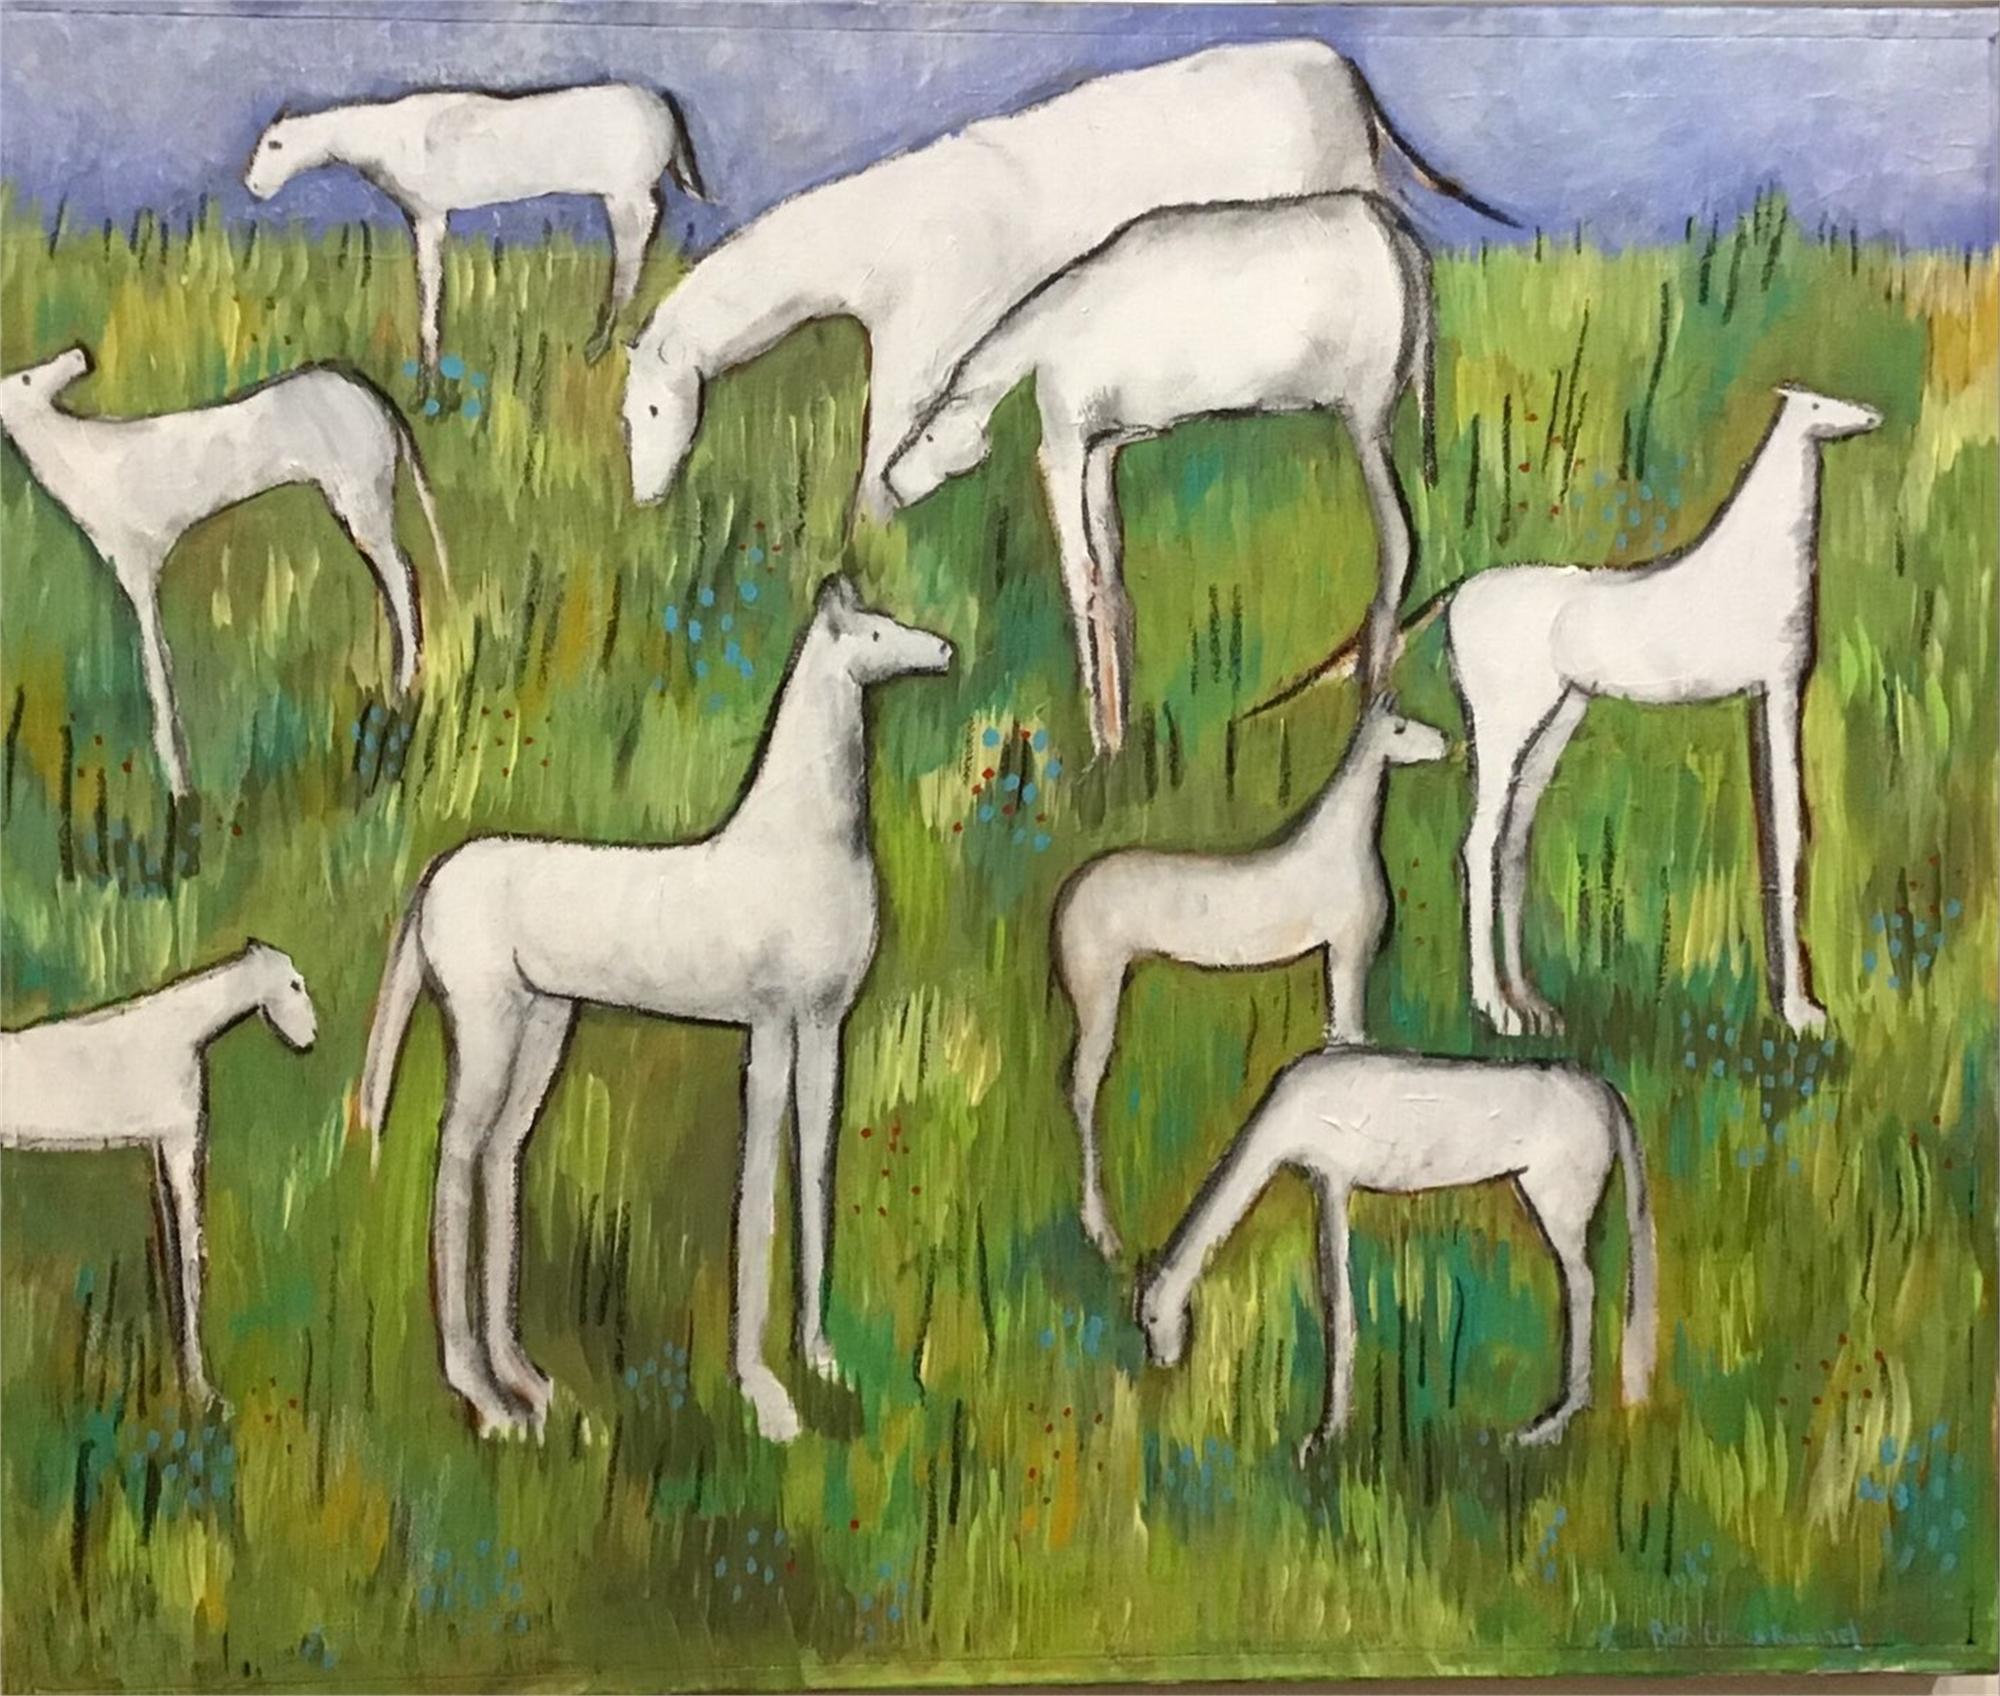 Herd Mentality by Beth Crews Rommel